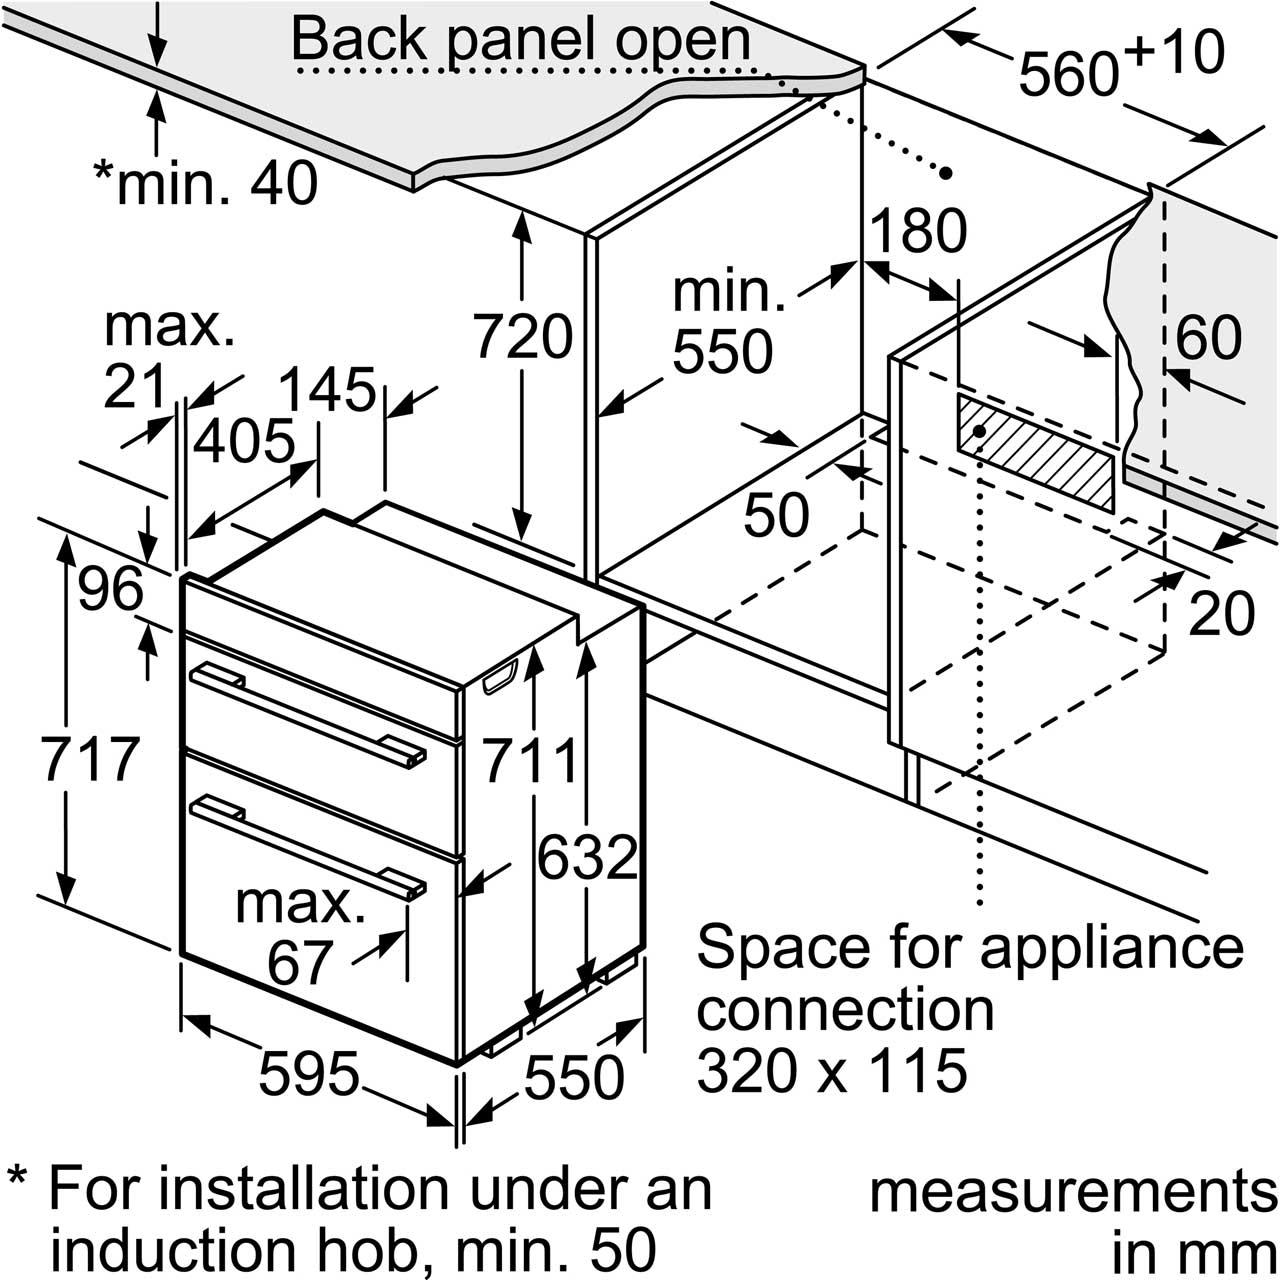 Kymco Mongoose 90 Wiring Diagram Kymco Agility 50 Wiring